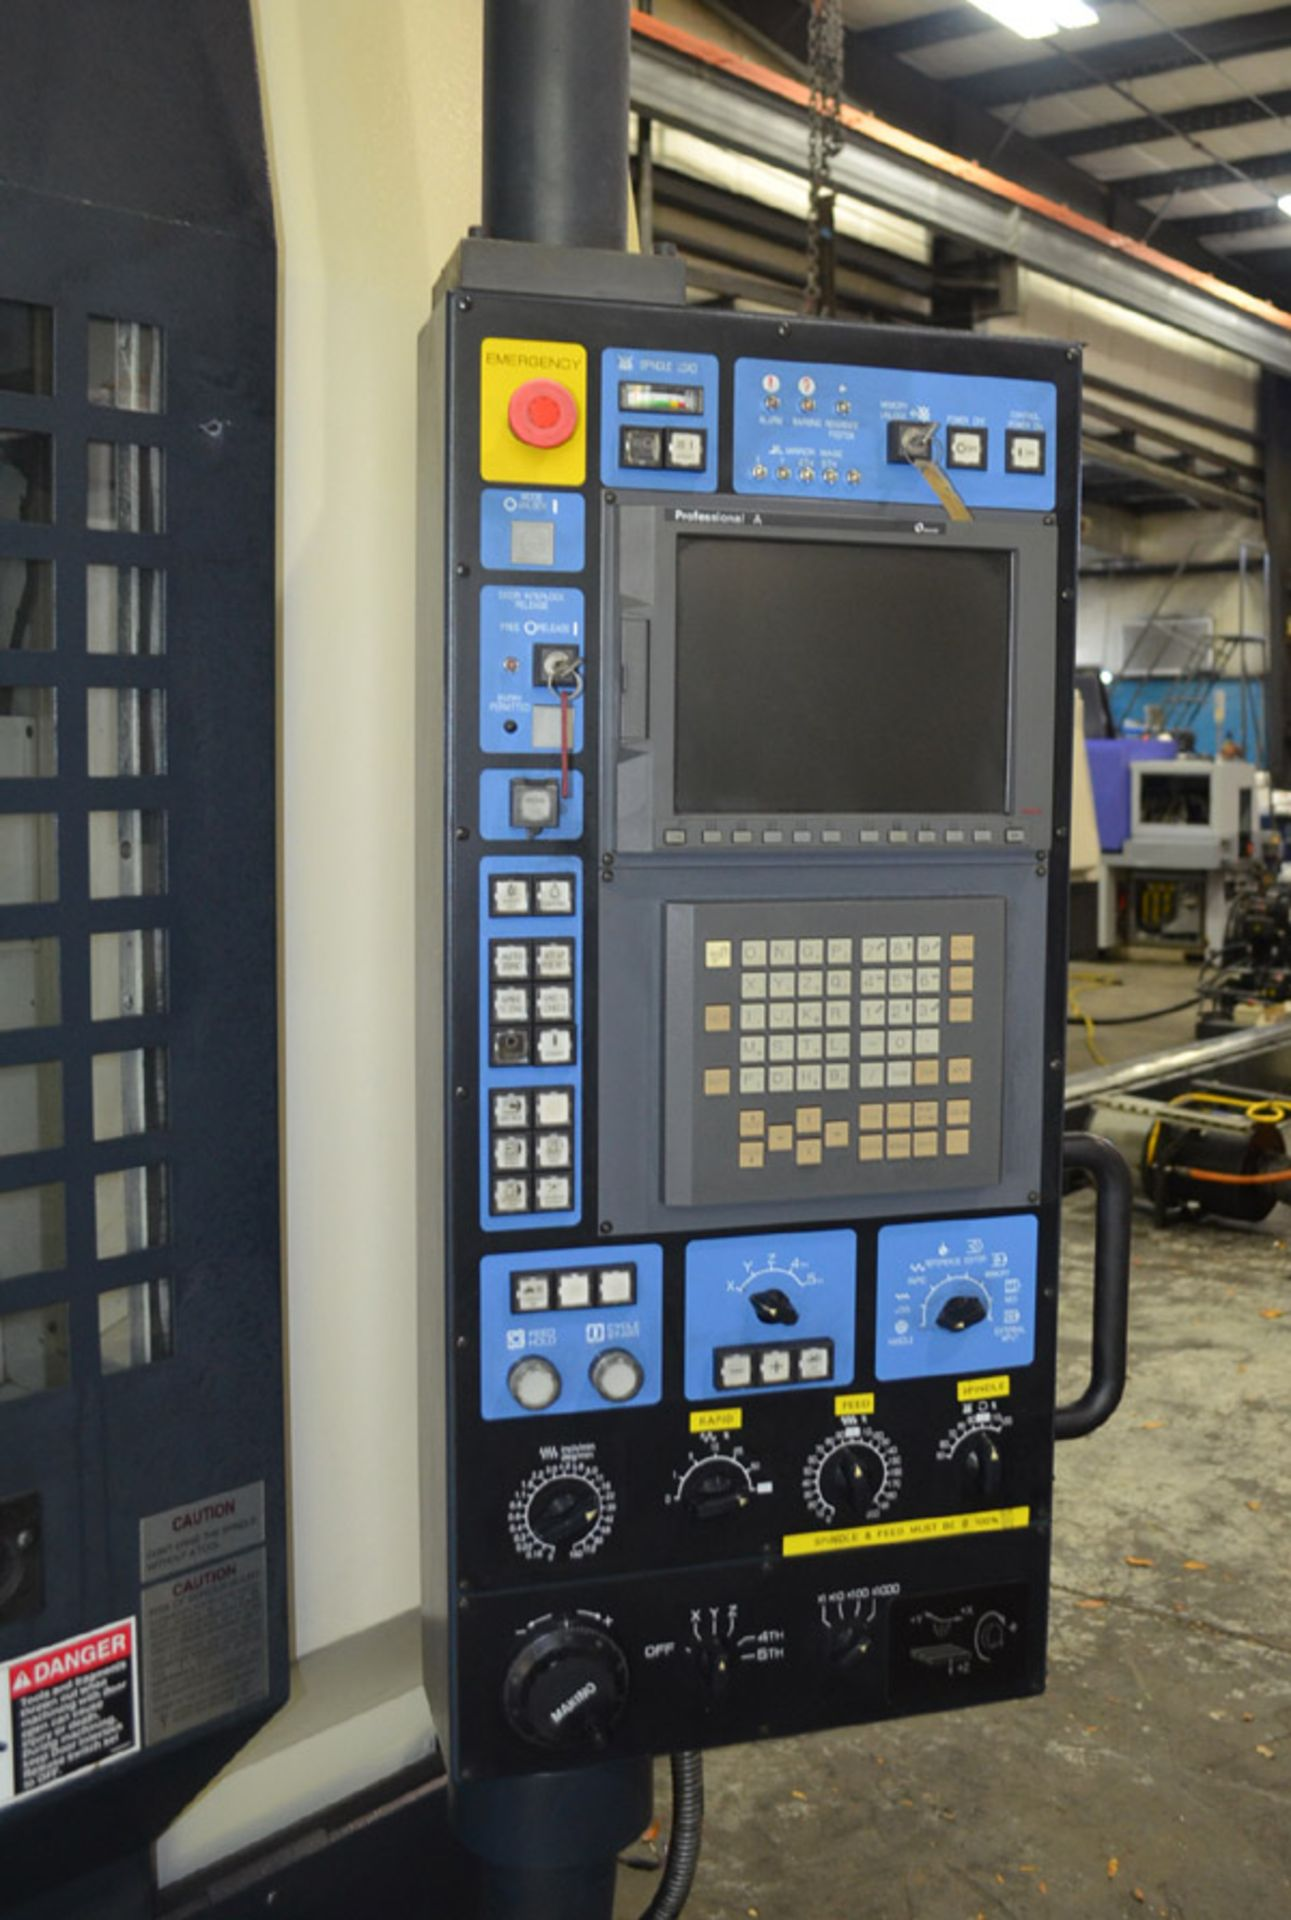 Lot 28A - Makino SNC64 High-Speed CNC Vertical Machining Center